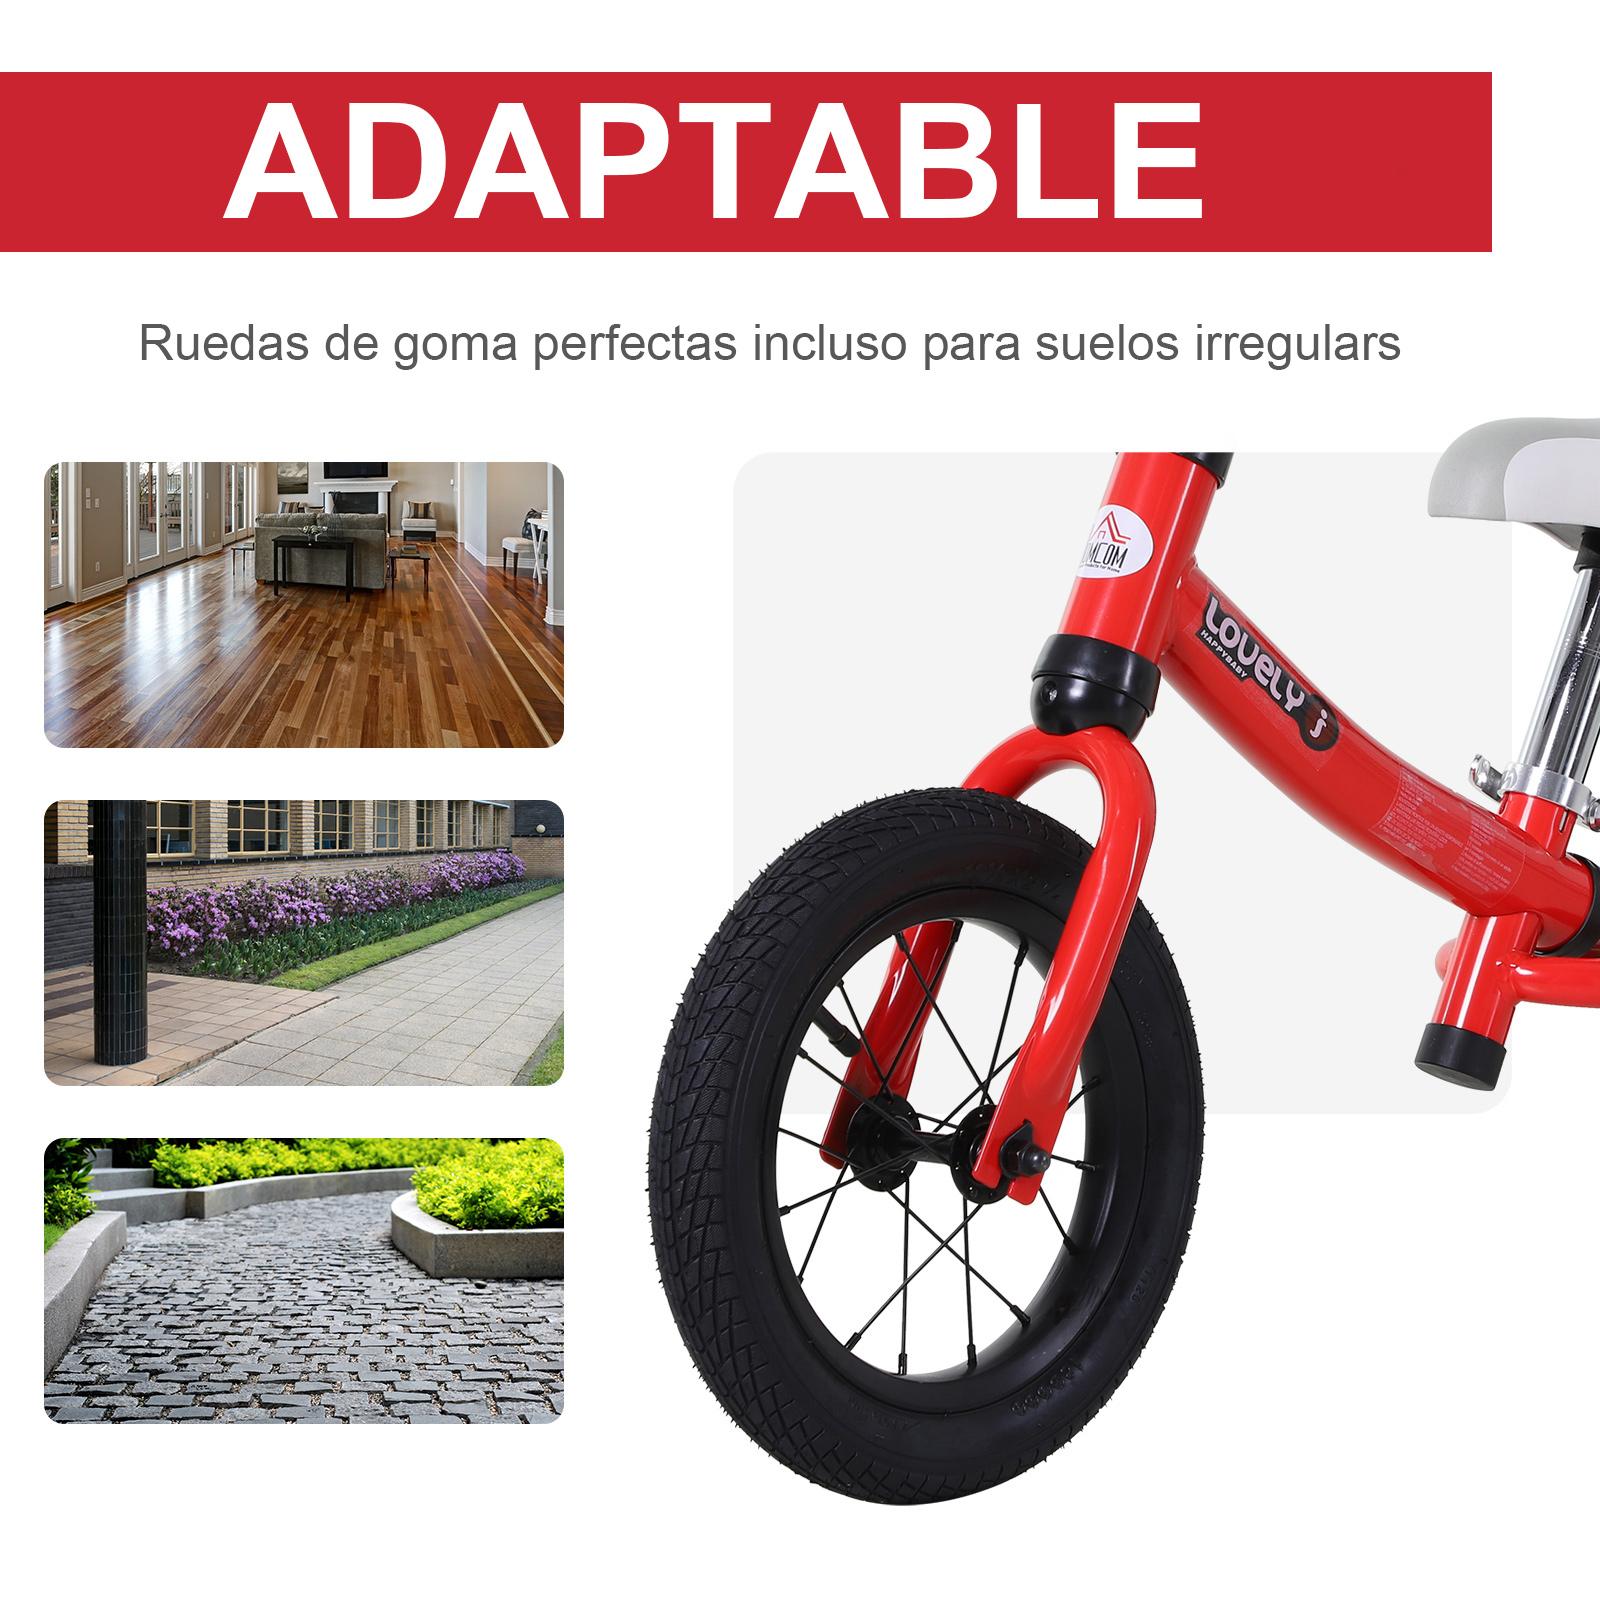 Bicicleta-sin-Pedales-de-Altura-de-Asiento-Regulable-31-45cm-2-5-Anos miniatura 19